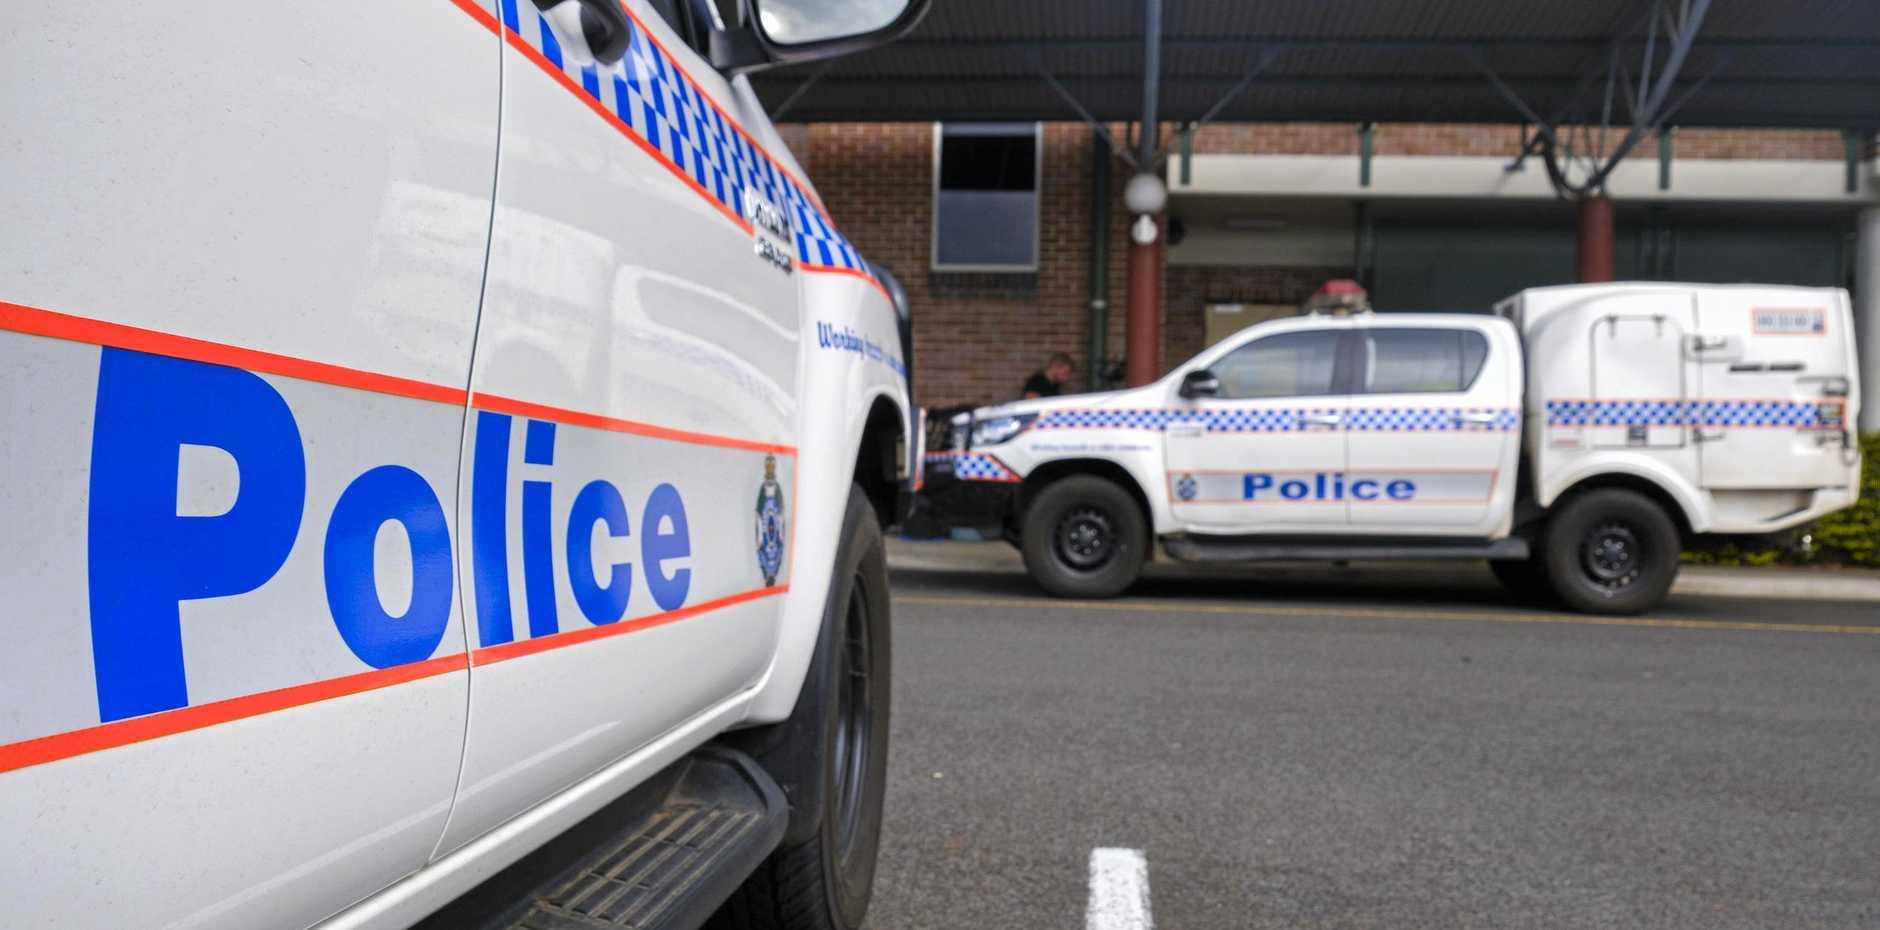 QPS: Police cars at the Bundaberg station.